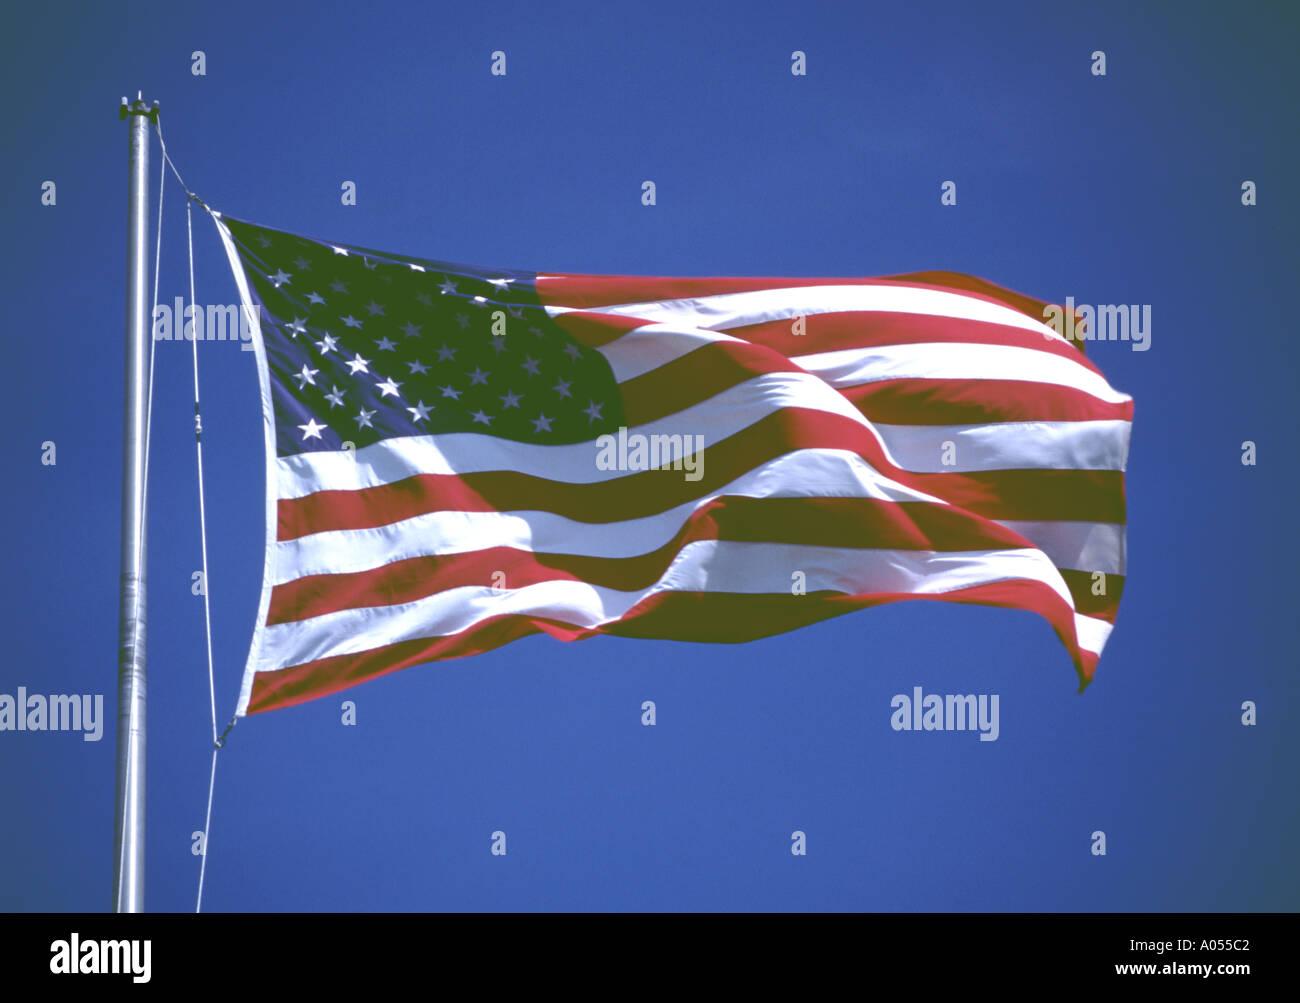 American Flag Symbol Nation Emblem Insignia Identity National Pride